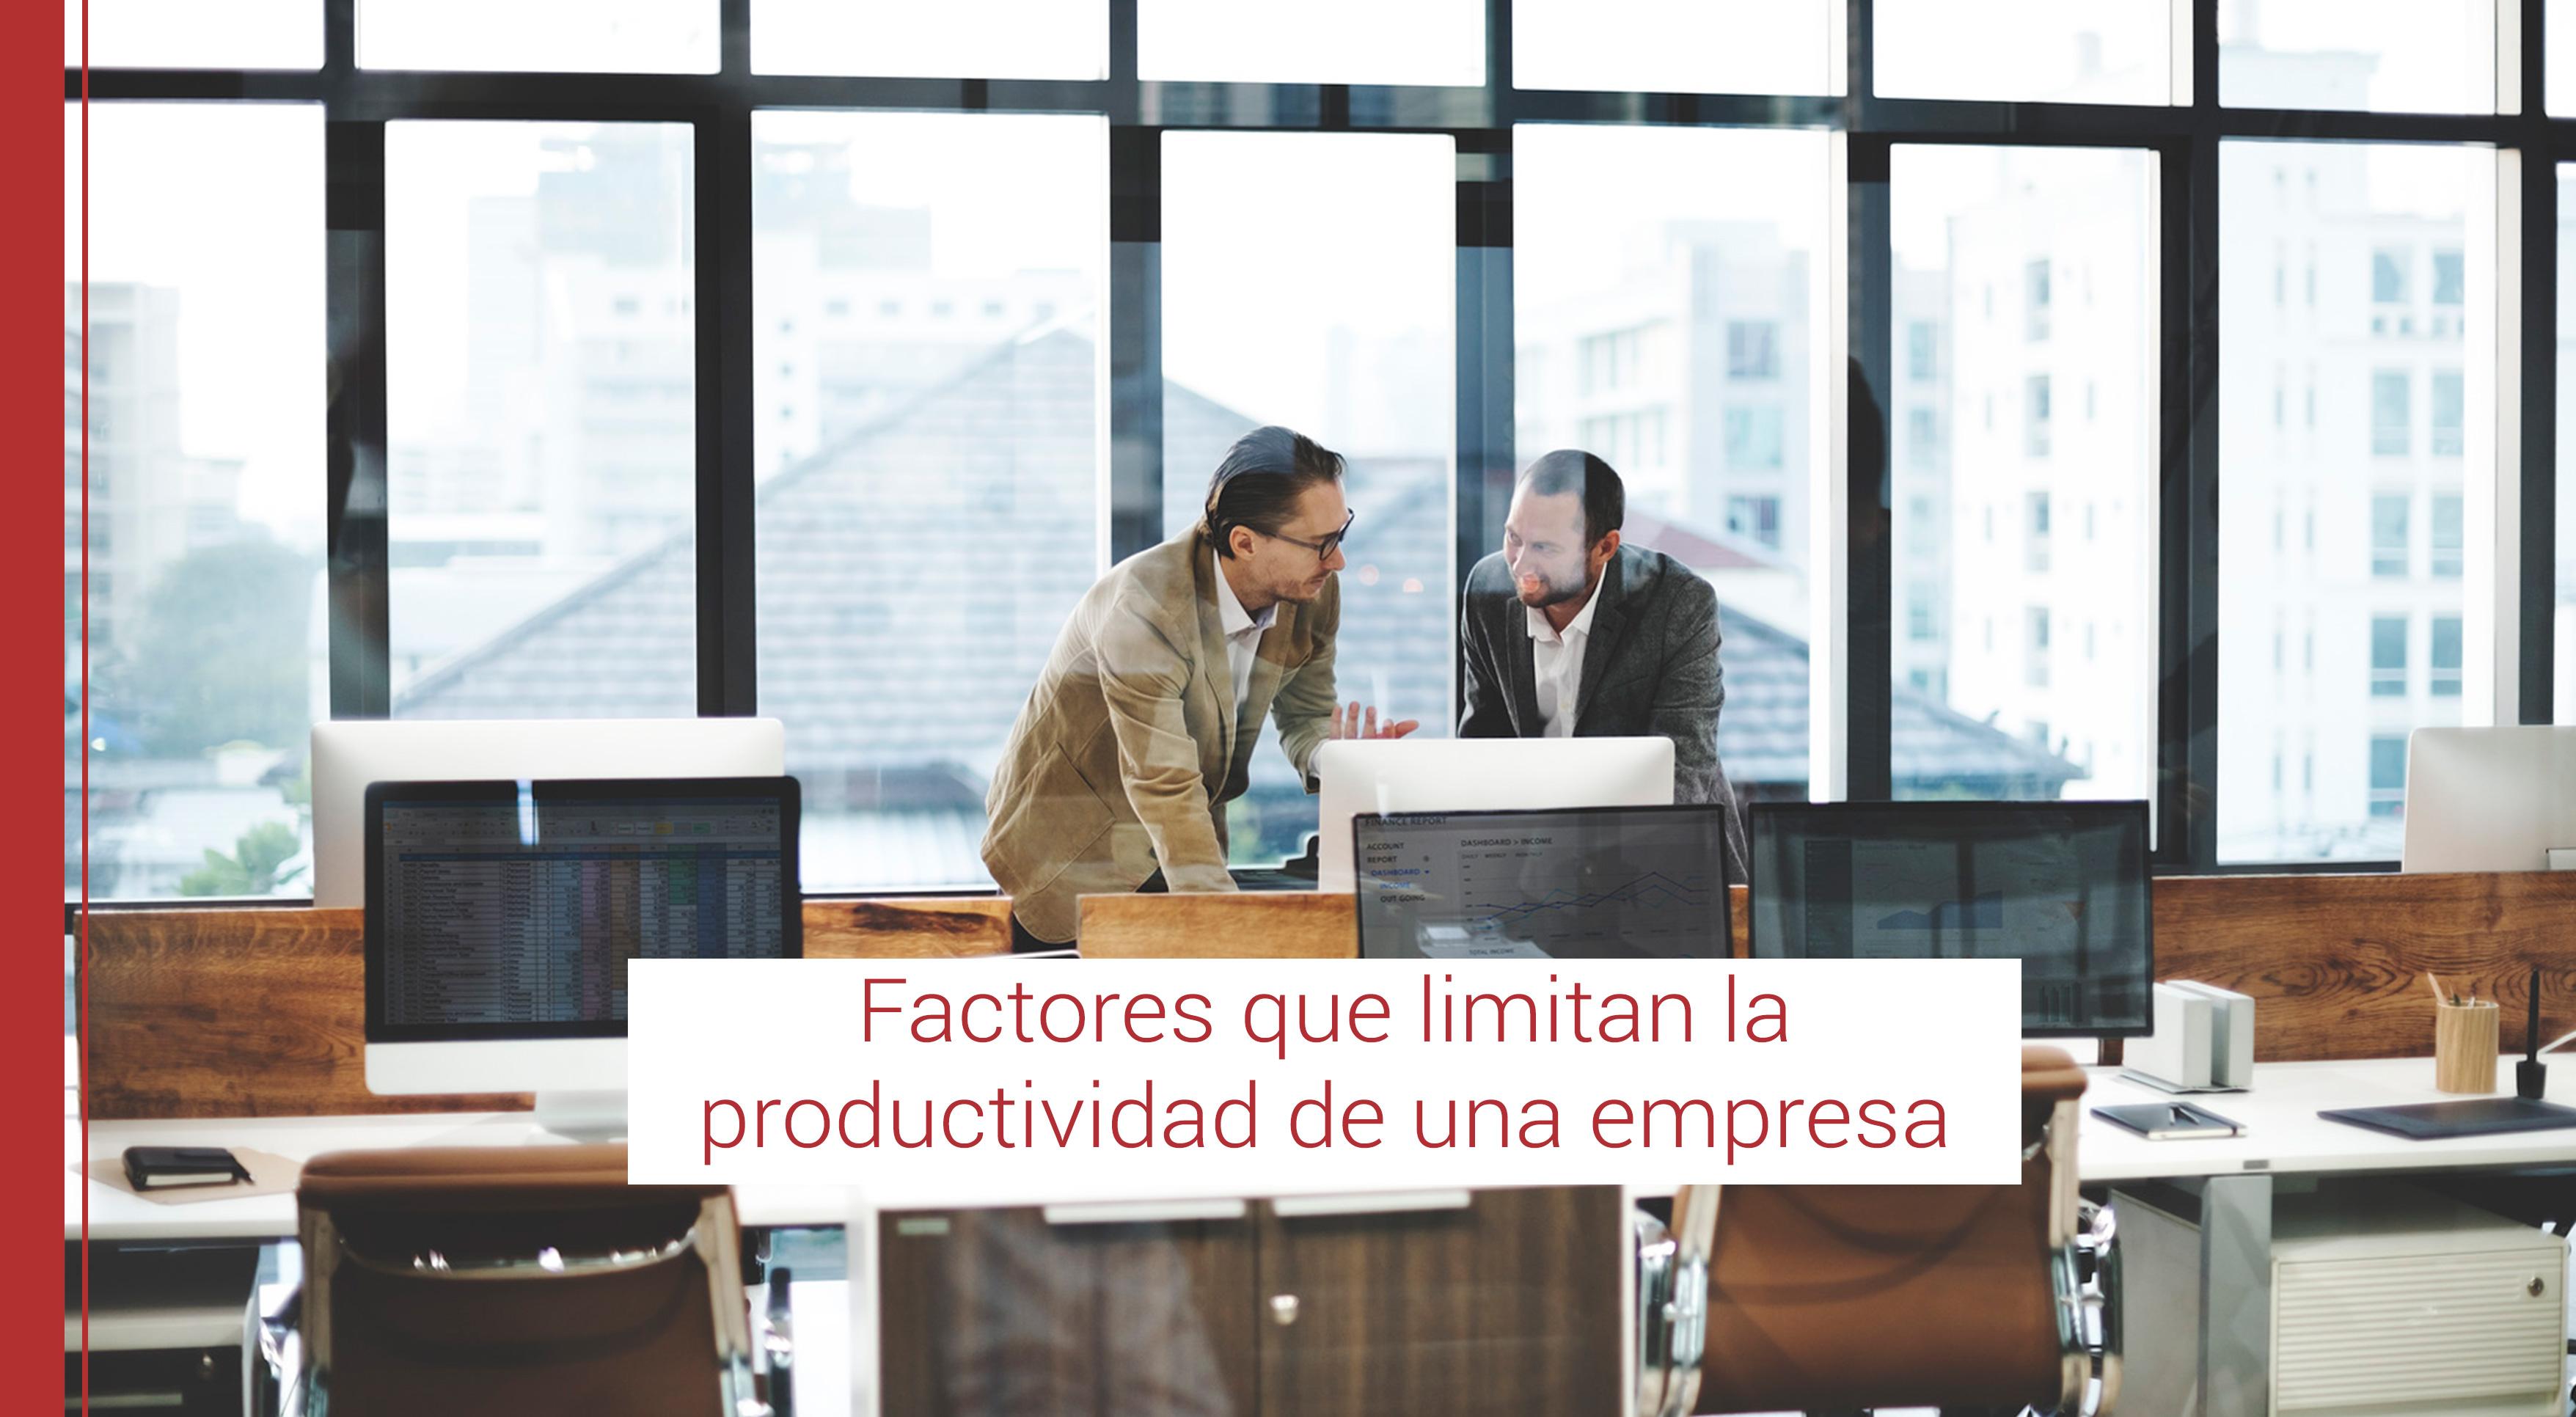 factores segun lean que limitan la productividad de una empresa